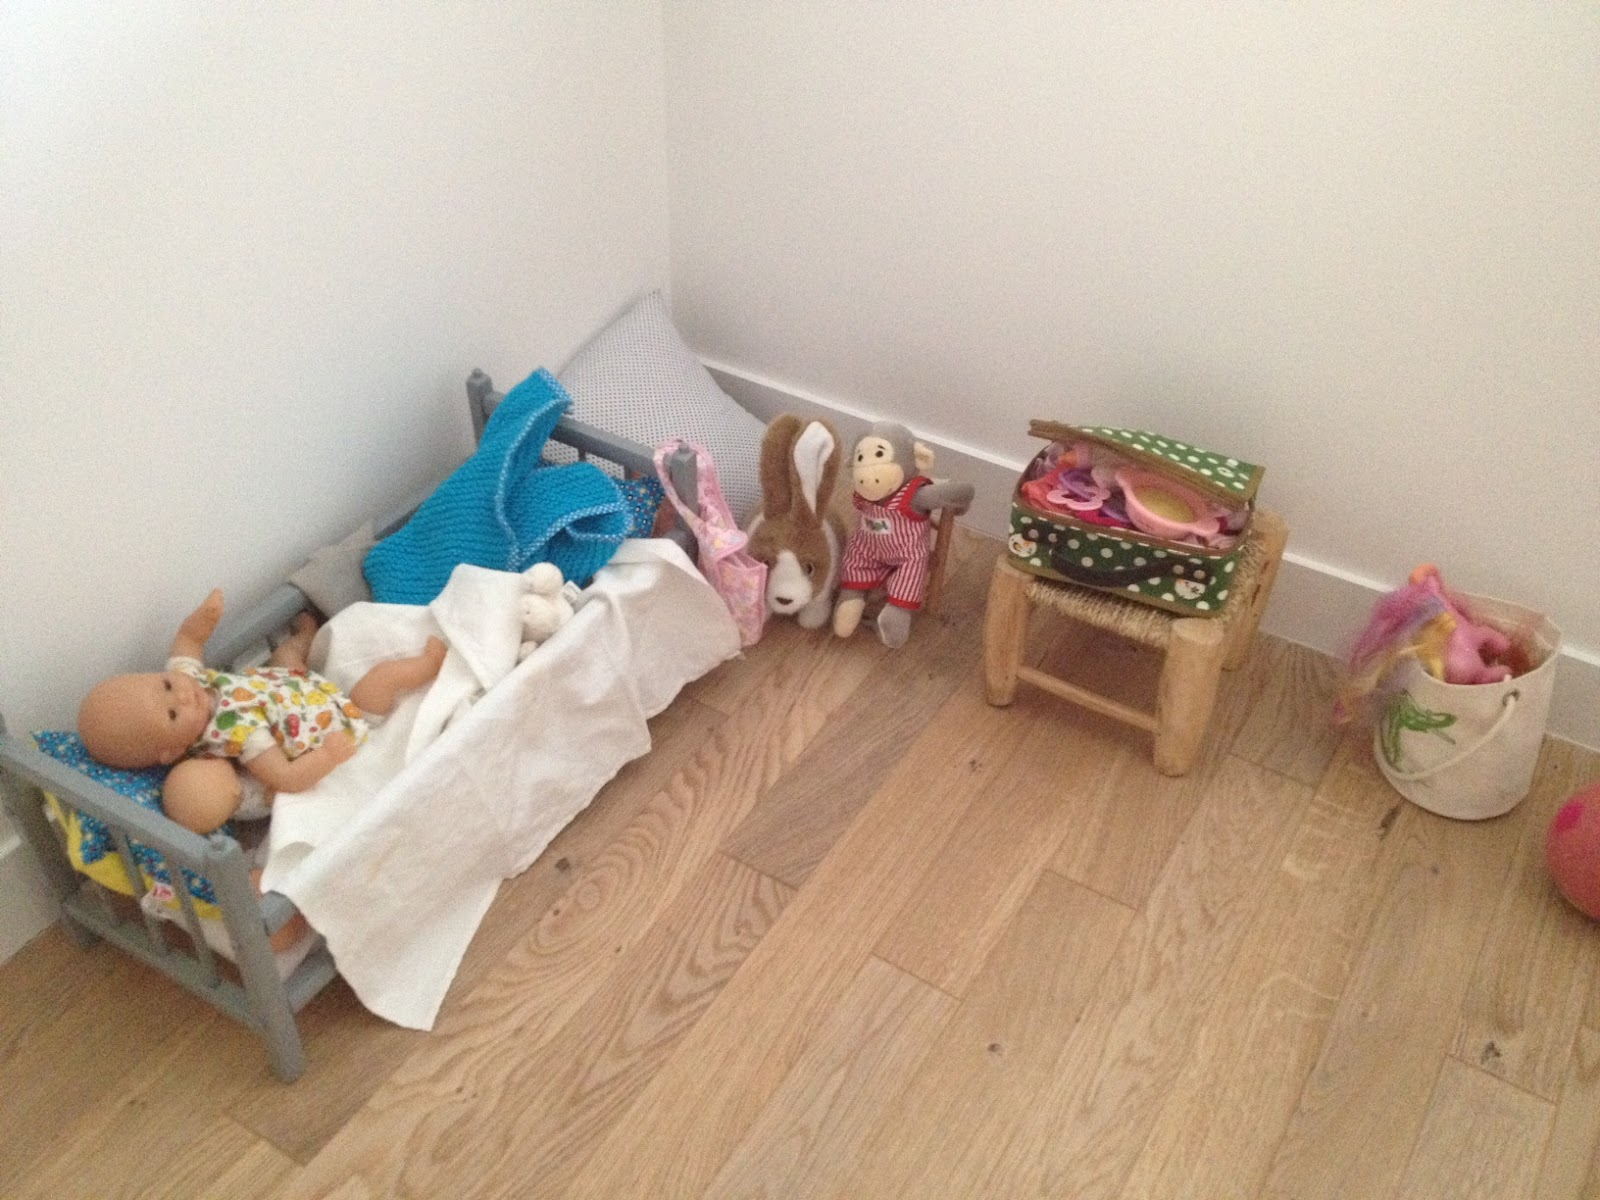 La girafe dans le placard id e d co de chambre d 39 enfant style loft for Idee deco slaapkamer baby jongen